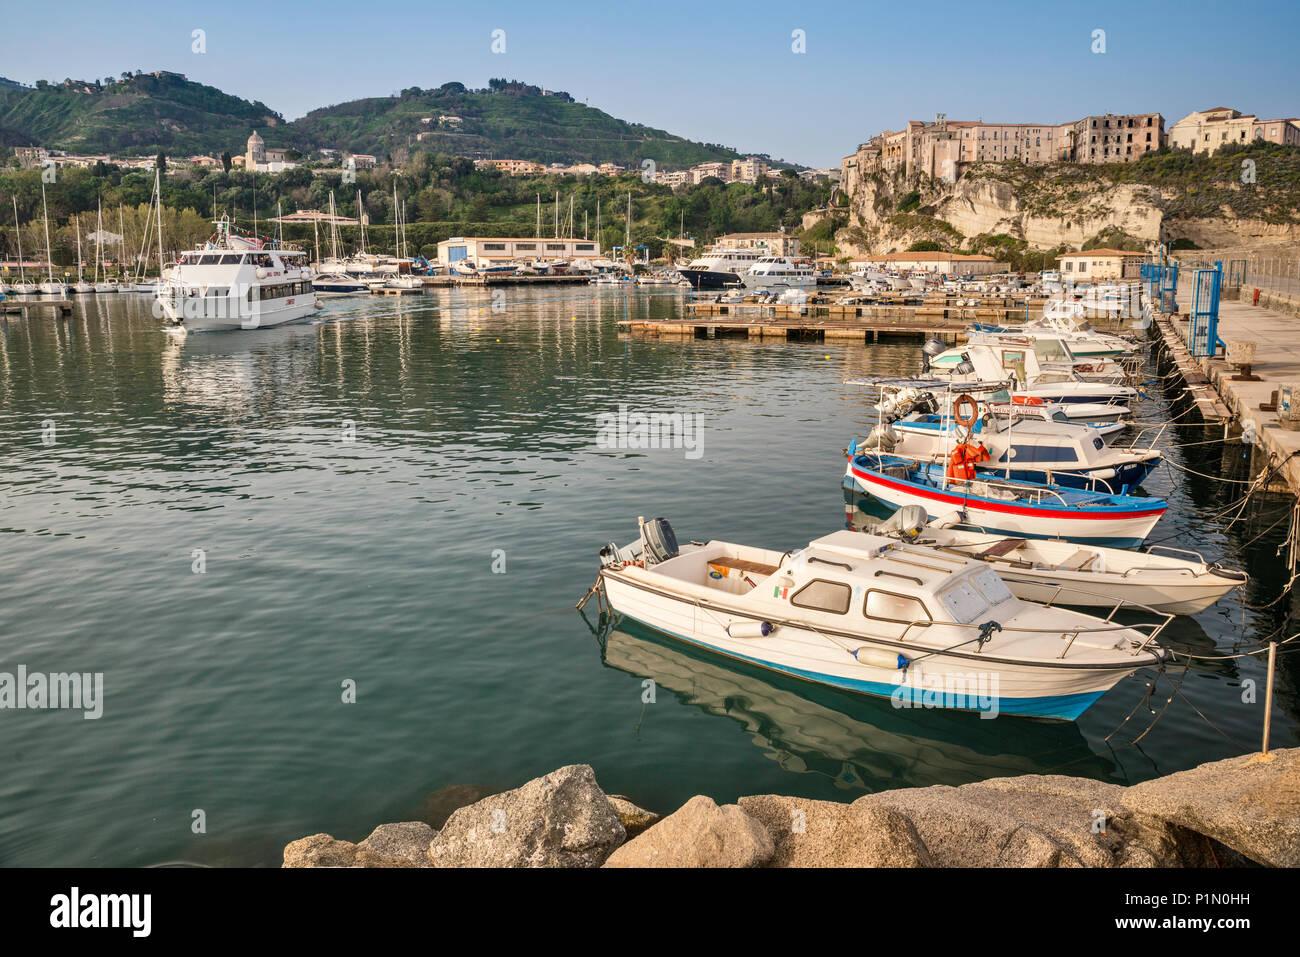 Boats at marina in Tropea, Calabria, Italy - Stock Image